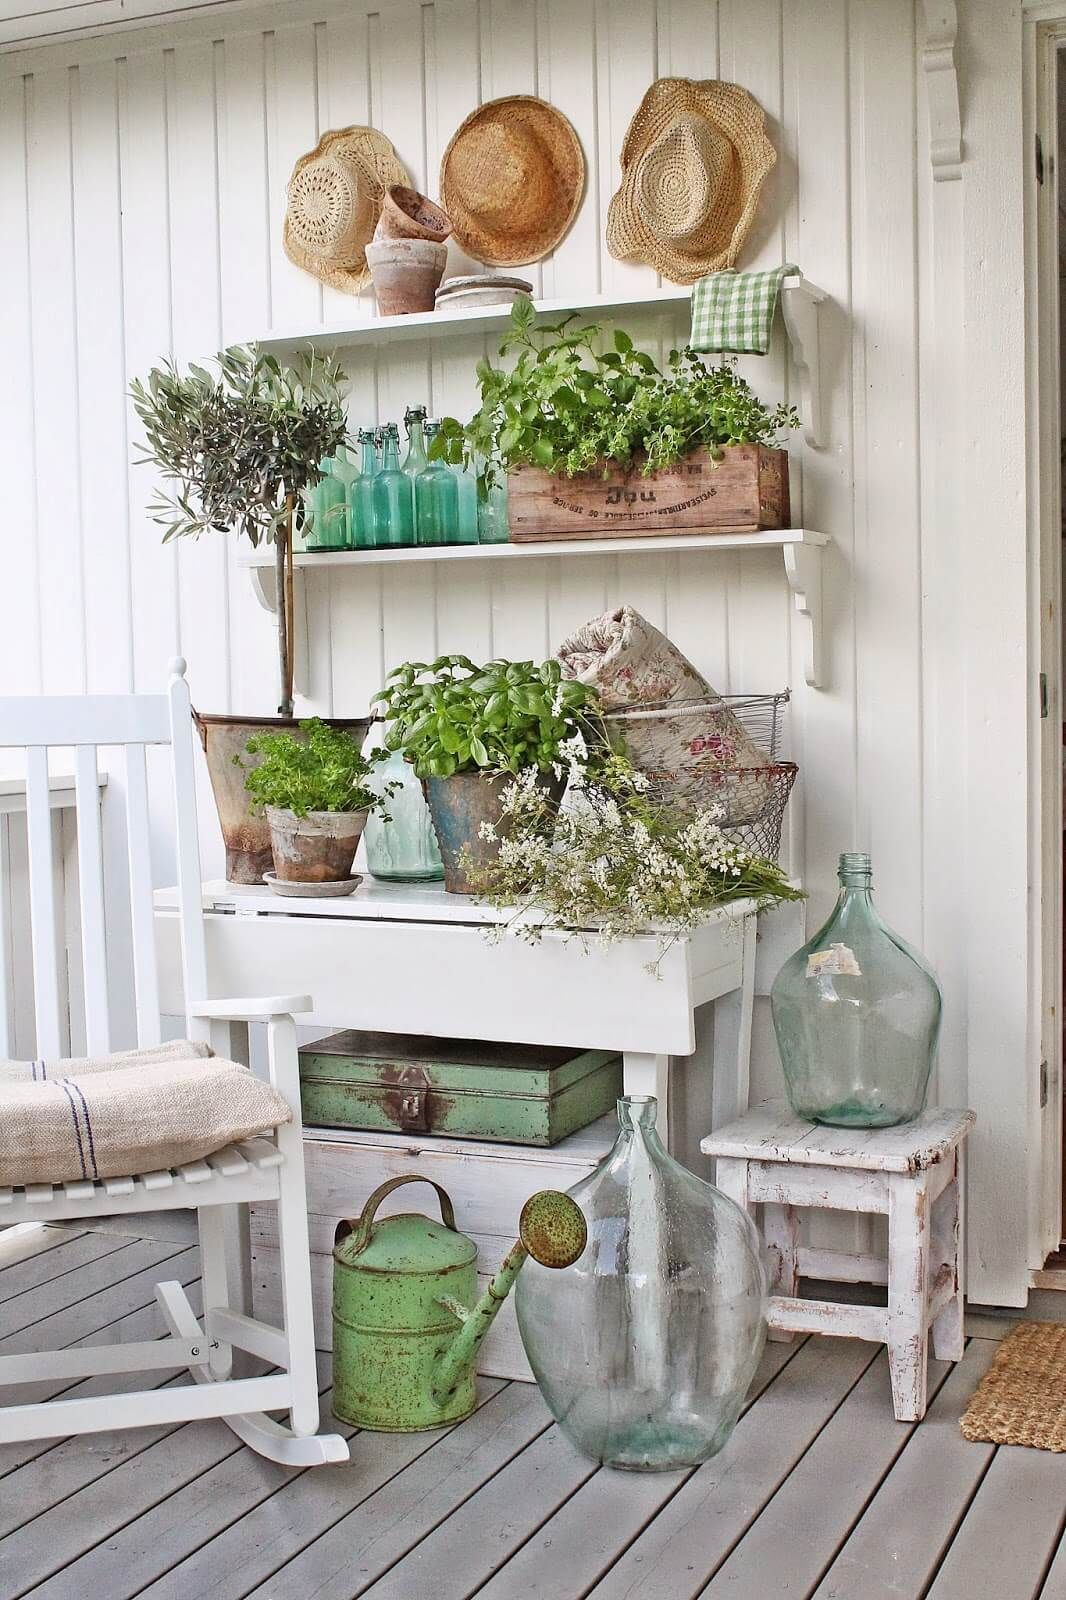 47 Rustic Farmhouse Porch Decor Ideas to Show Off This Season ...